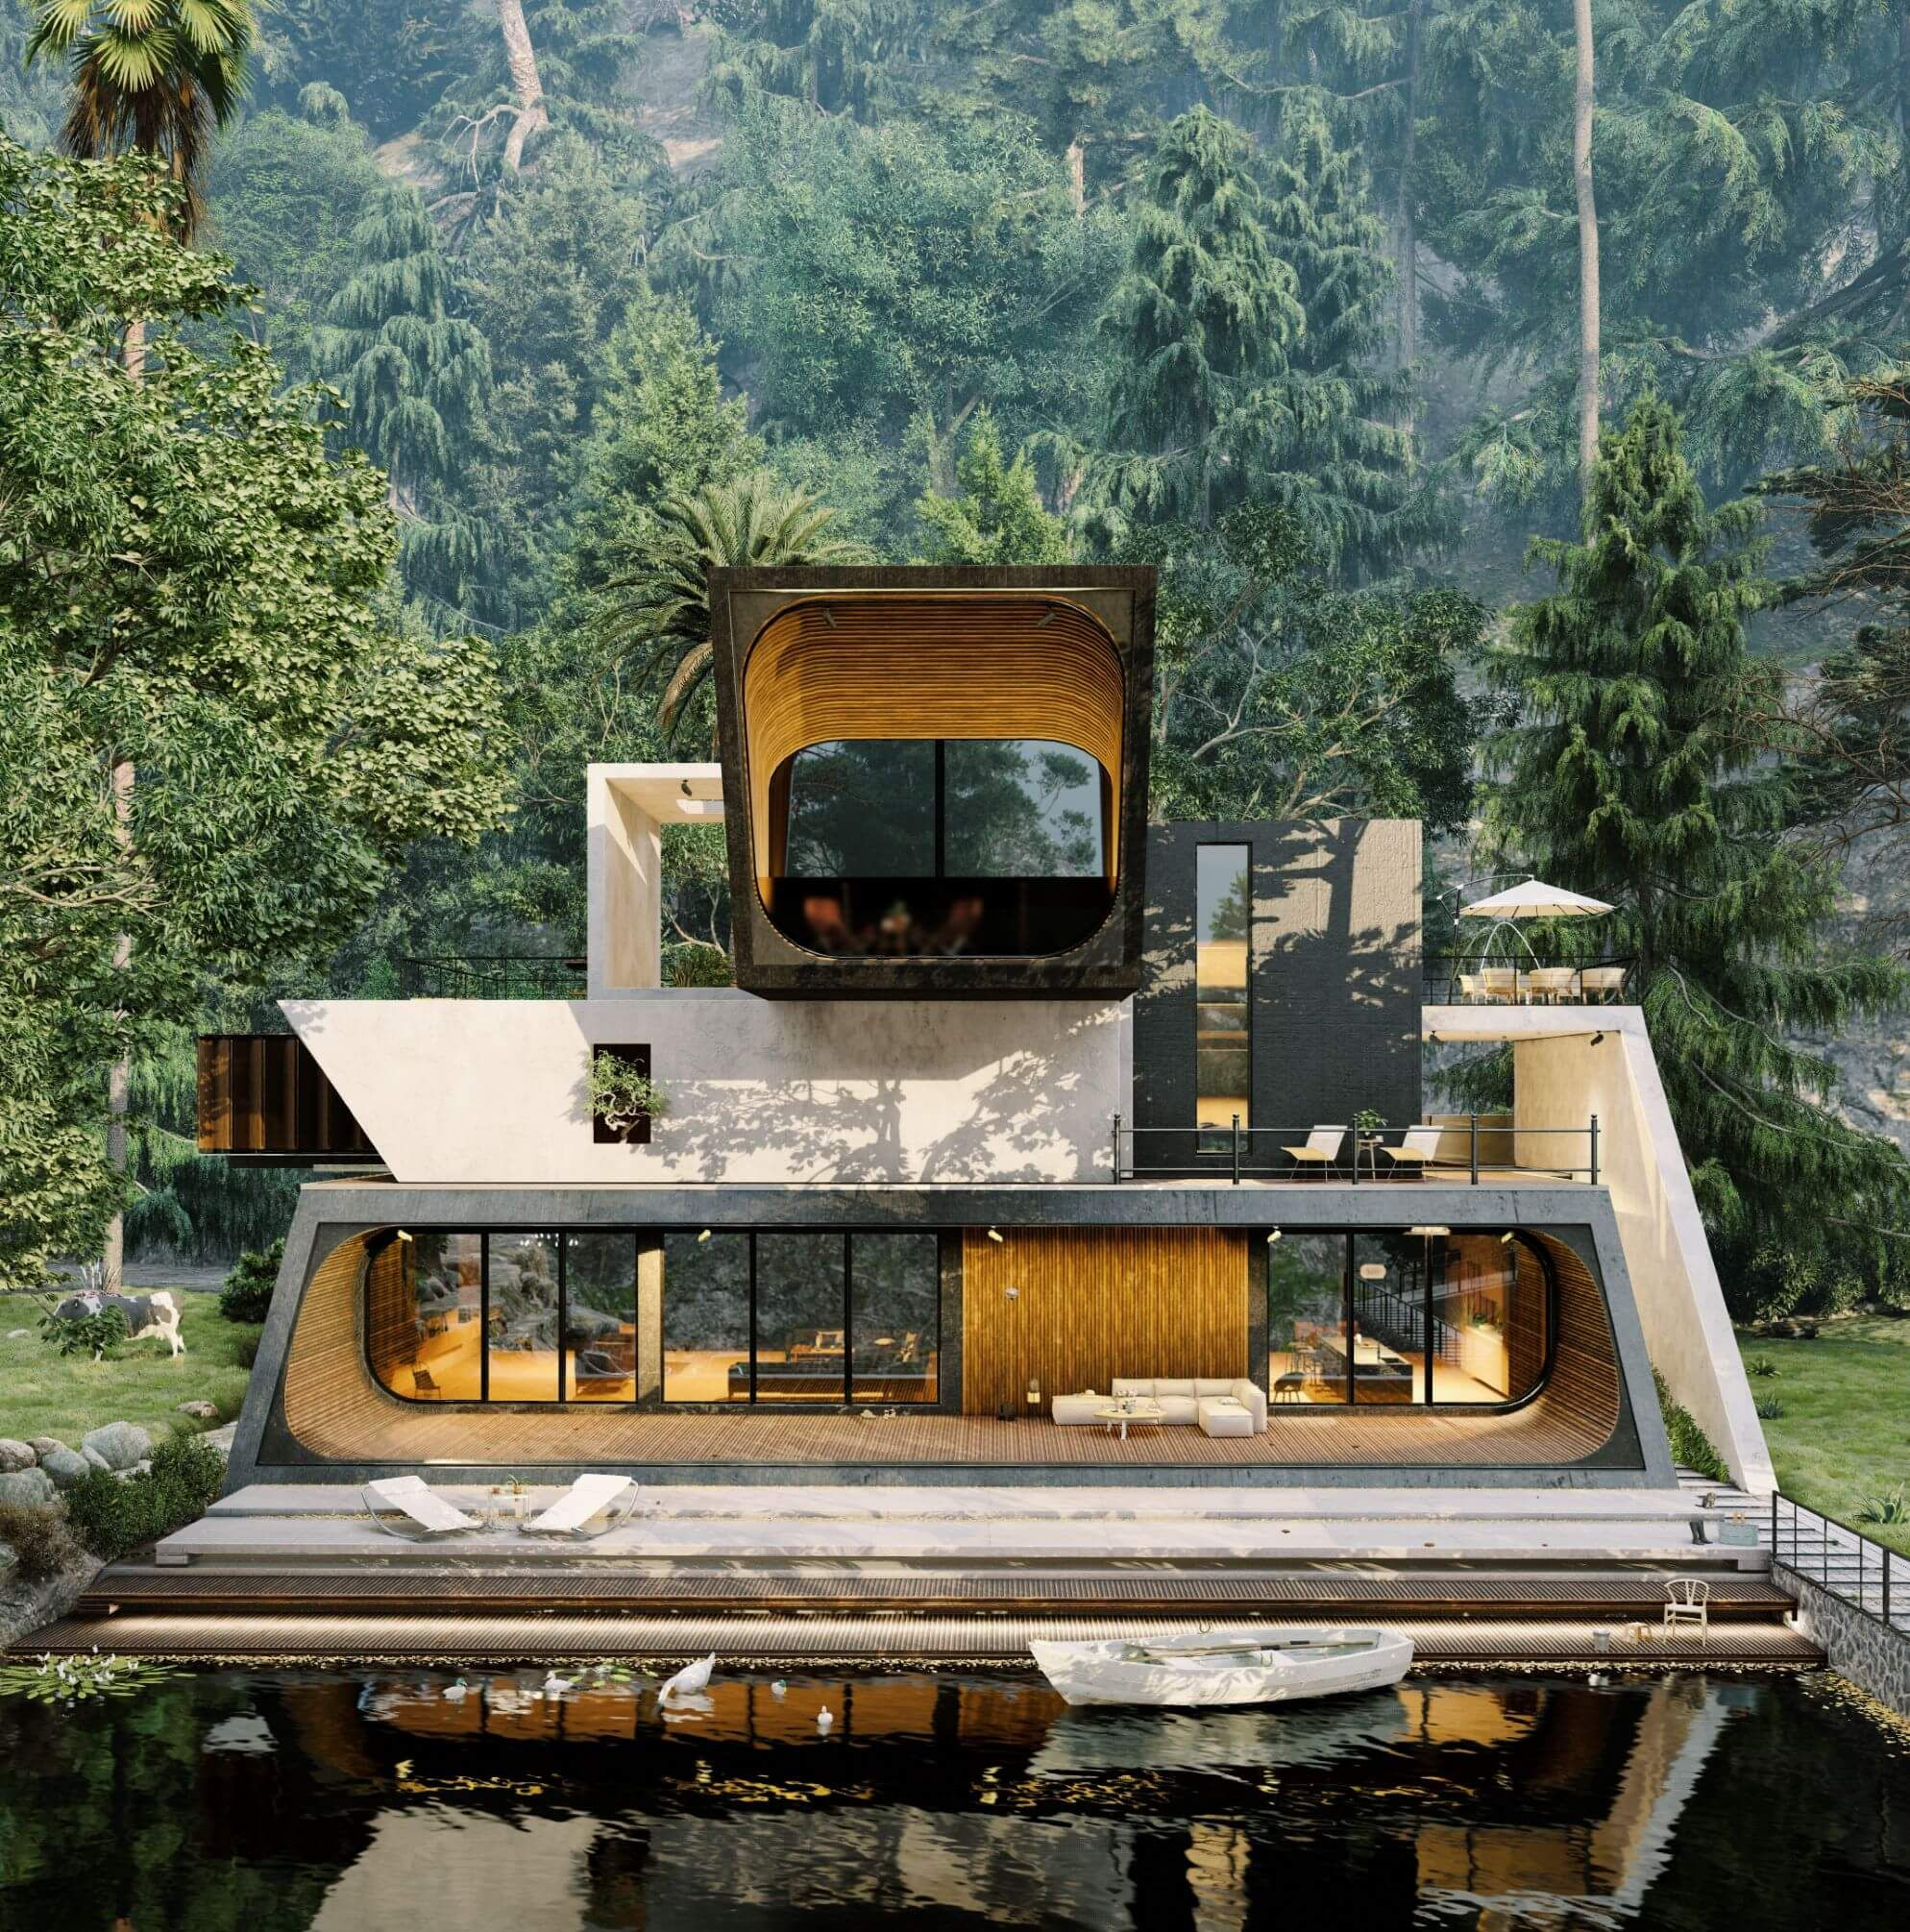 Villa Sculler in Ramsar, Iran by Didformat Studio